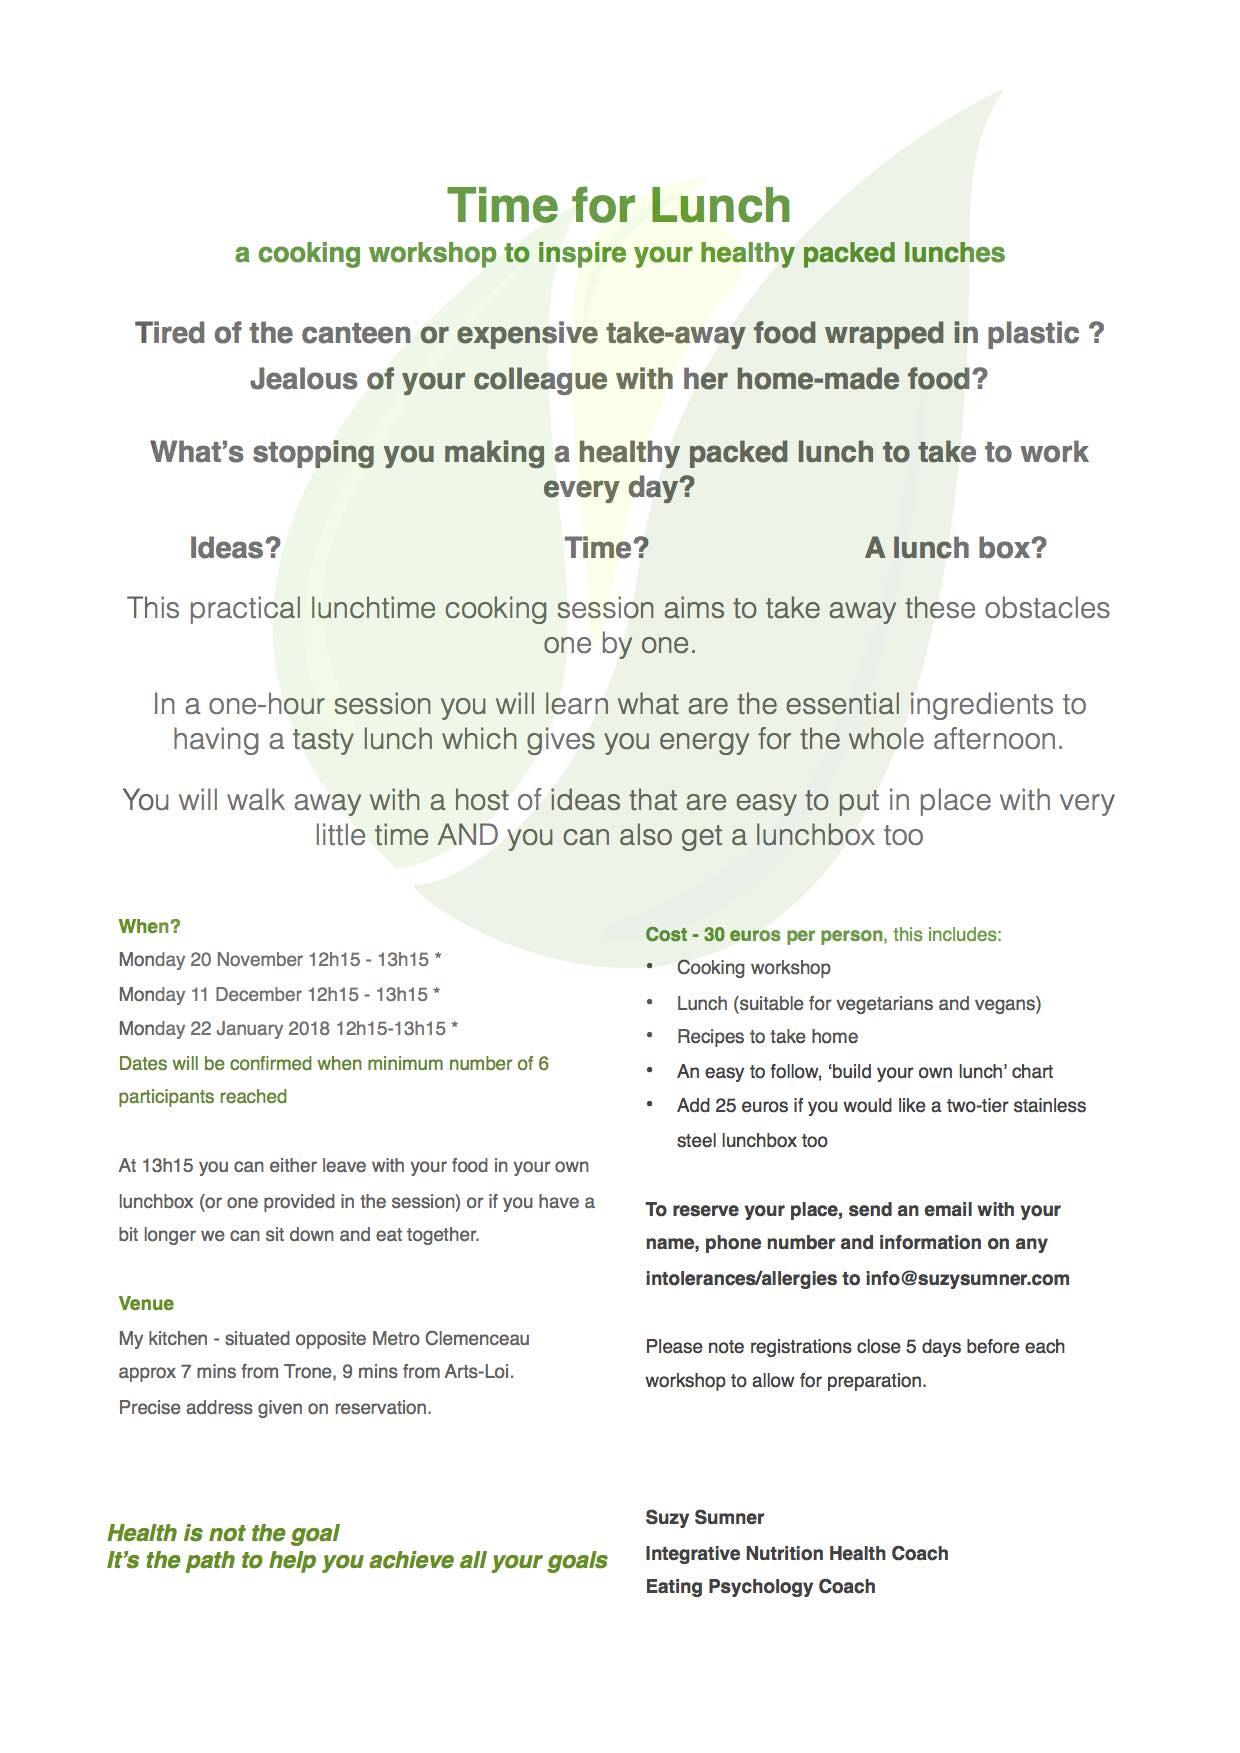 Time for Lunch Cooking Workshop Flyer.jpg